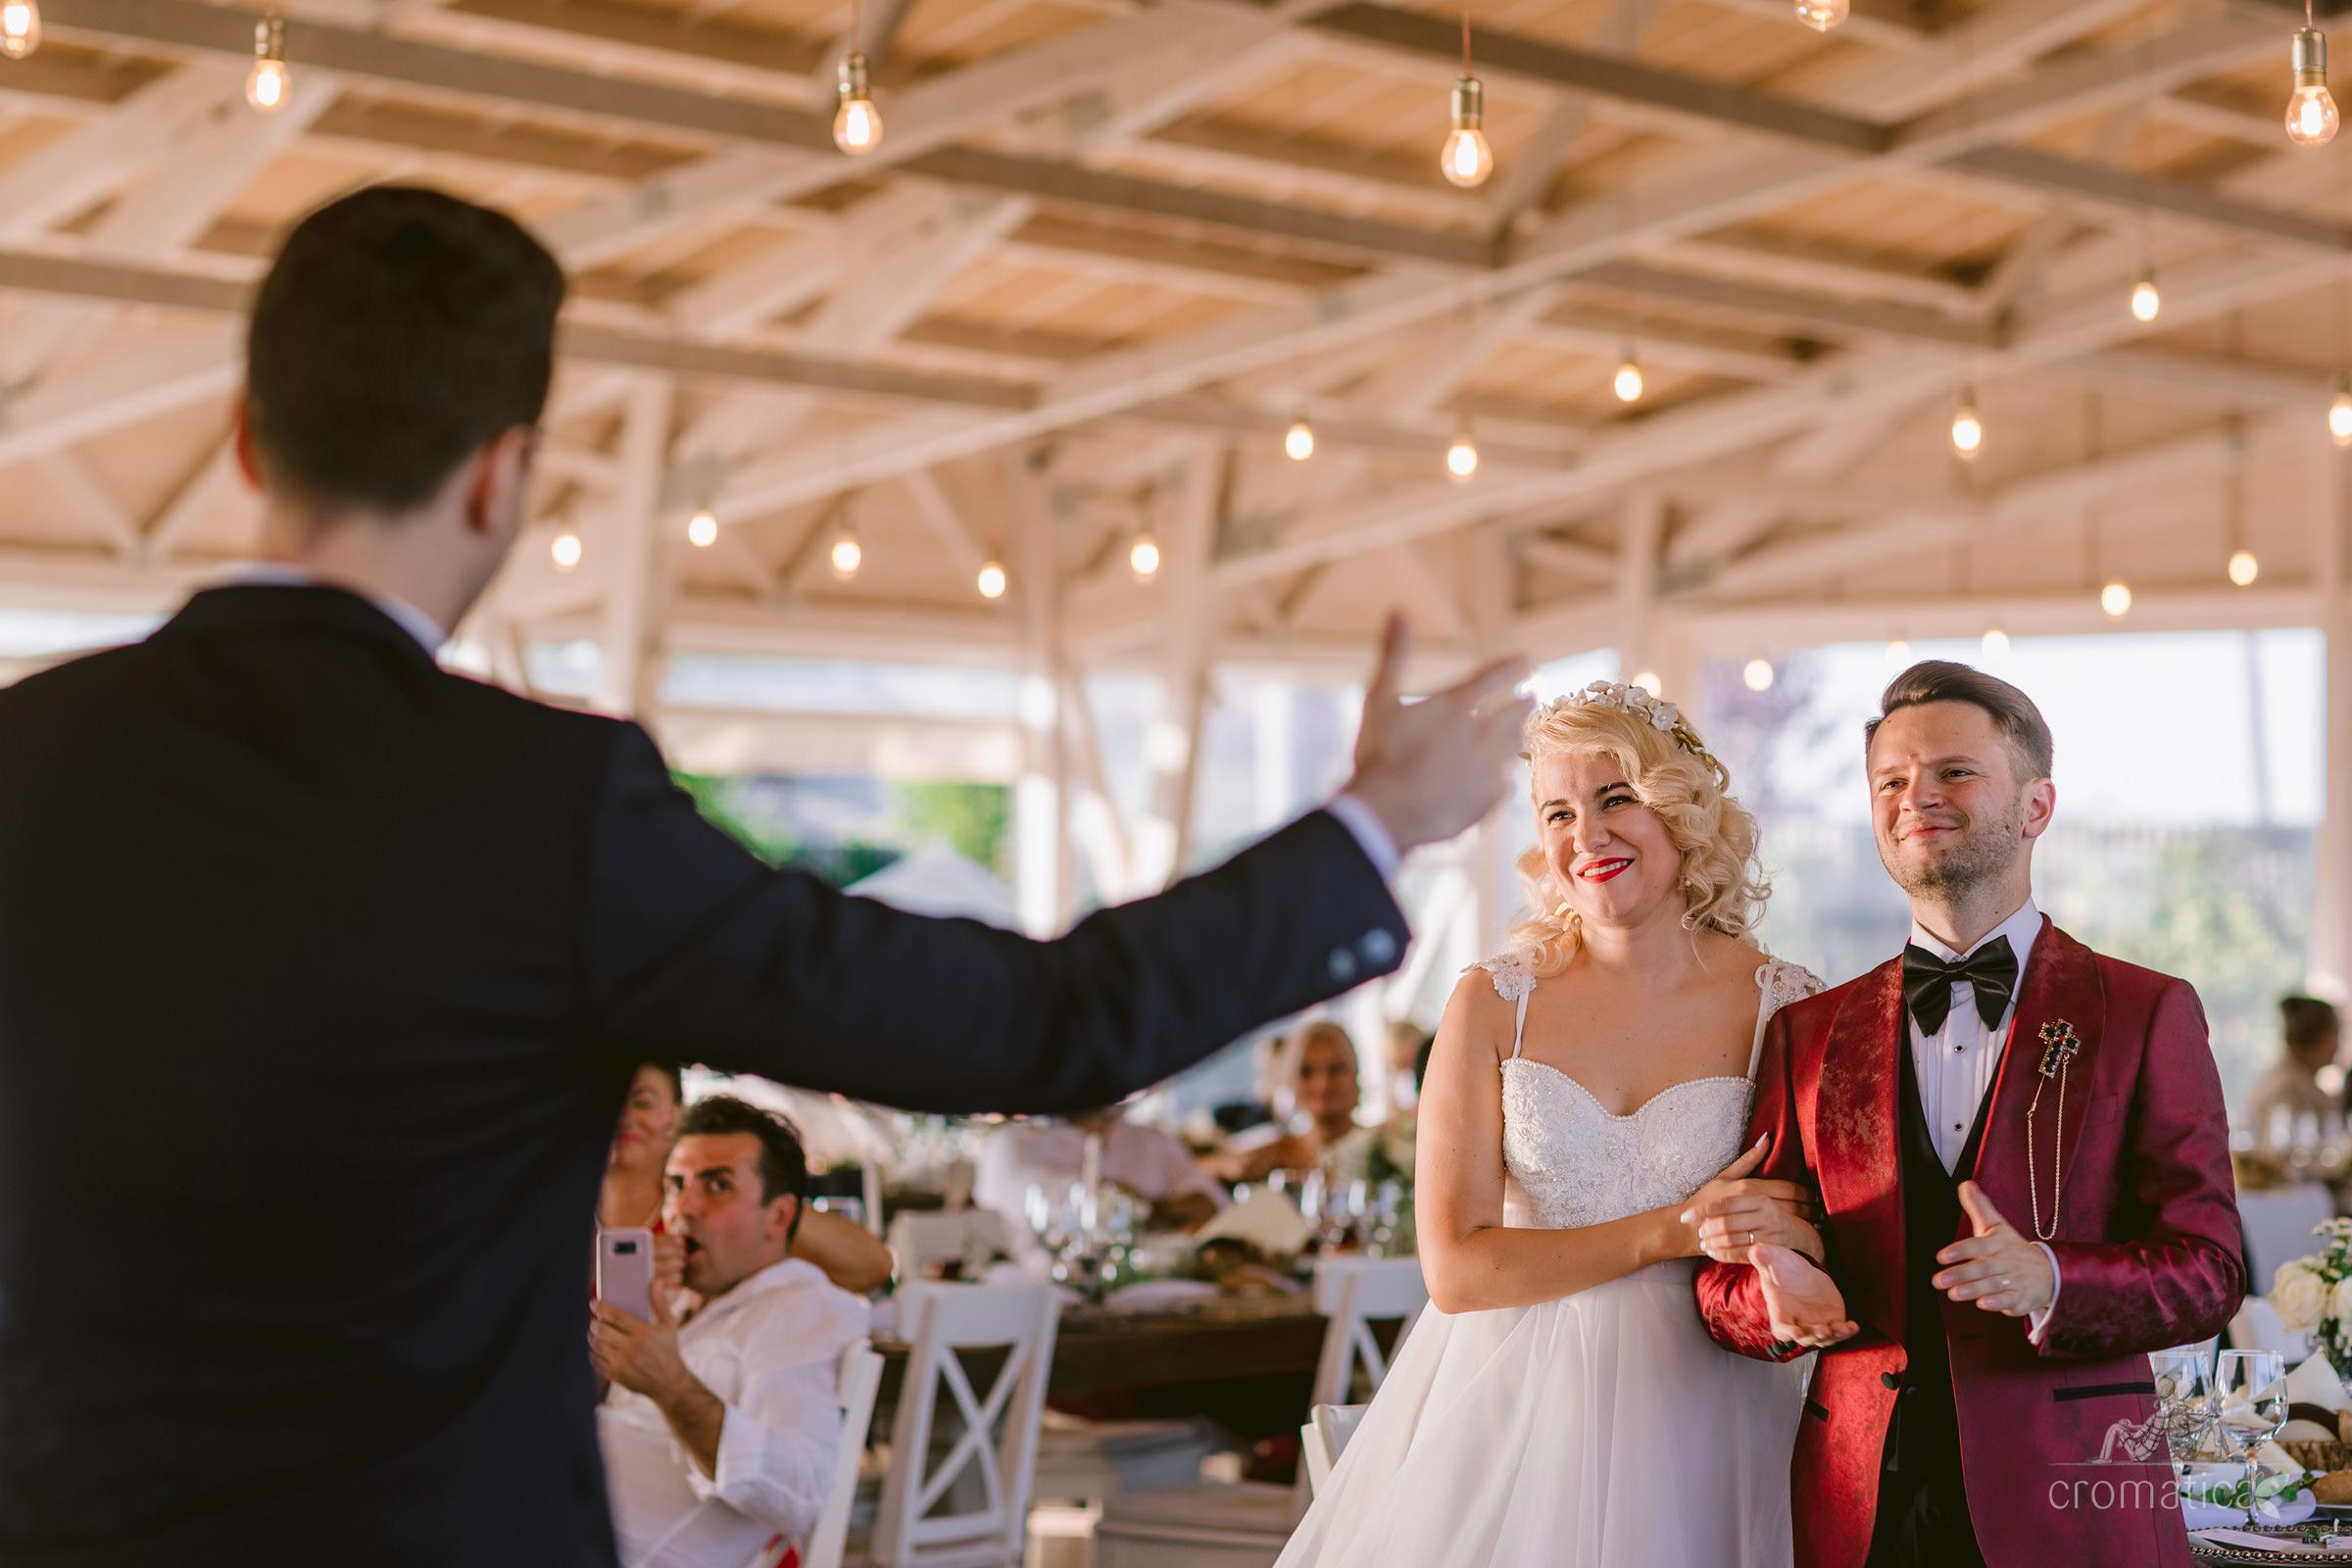 ana mihai fotografii nunta gradina lahovari 060